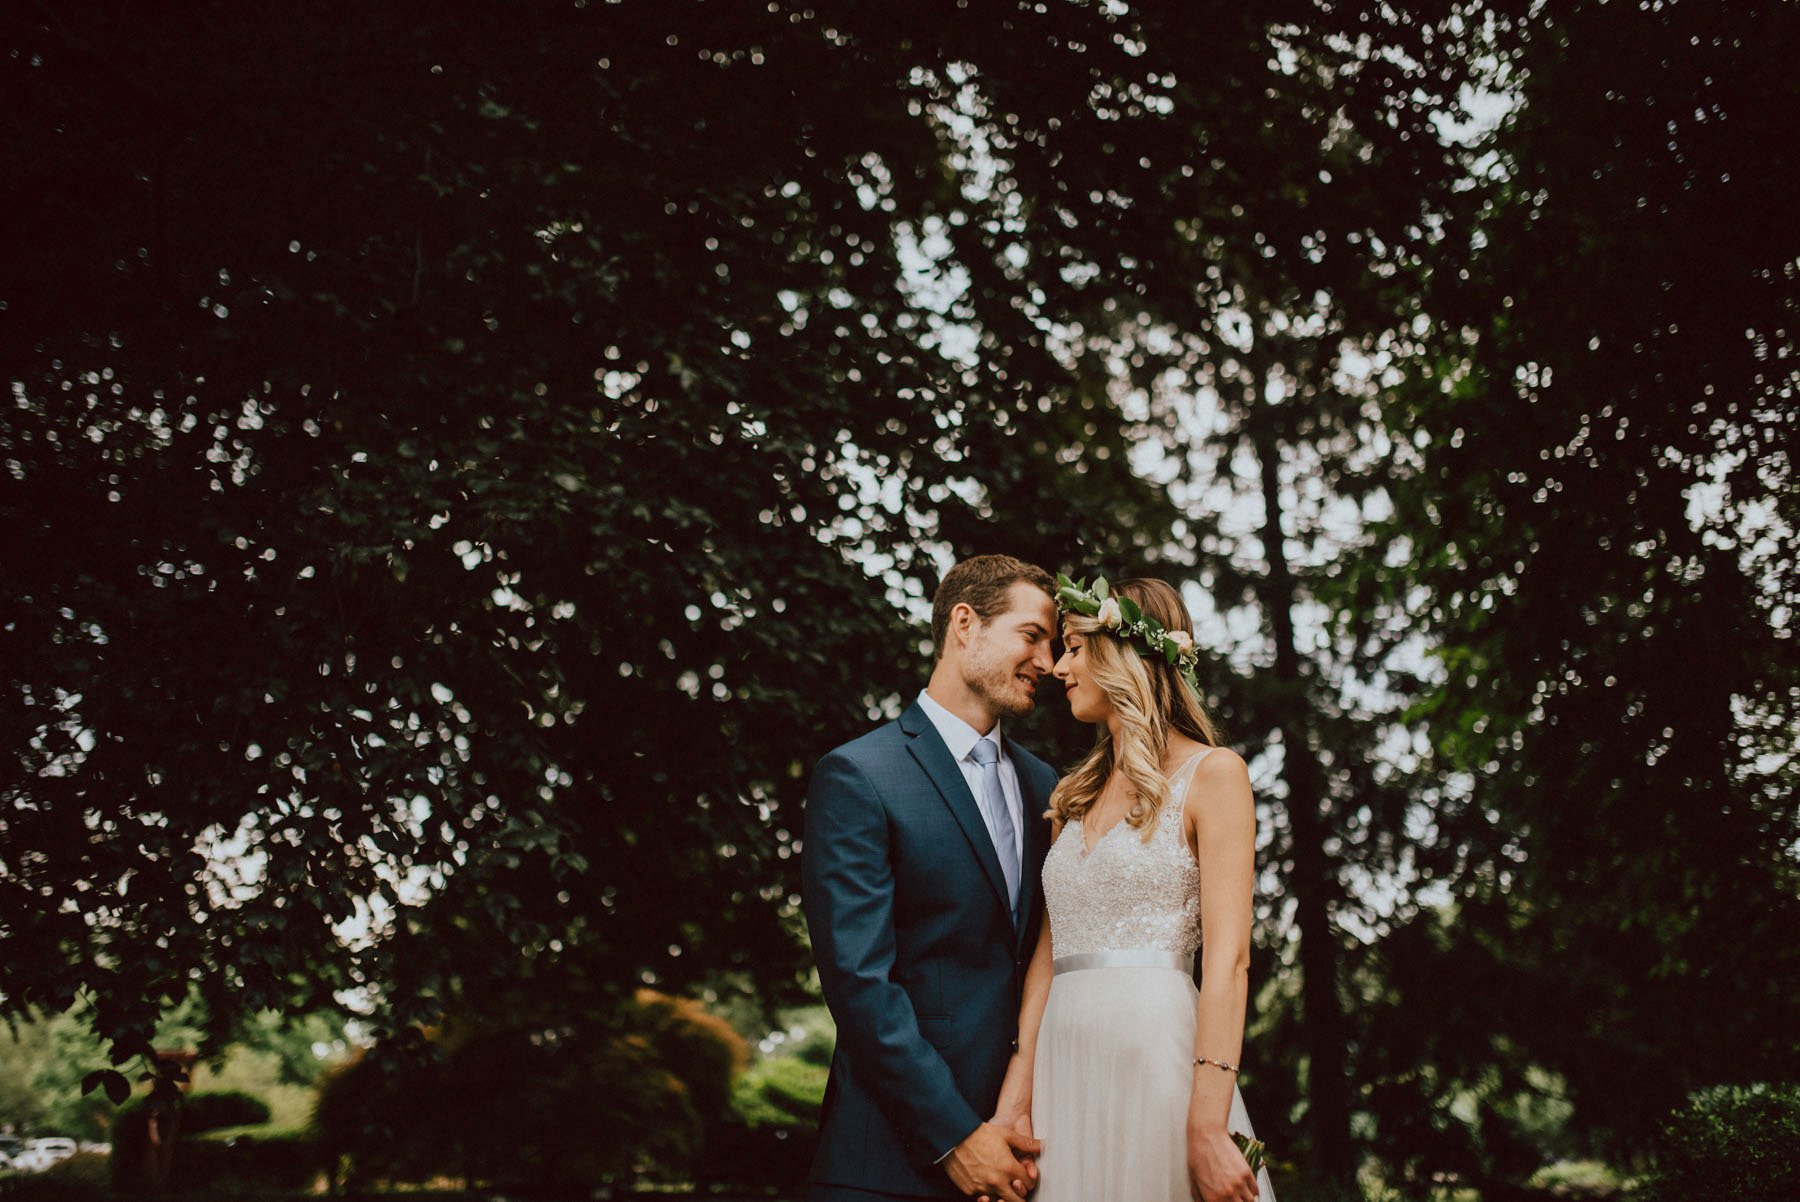 Knowlton-mansion-wedding-54.jpg